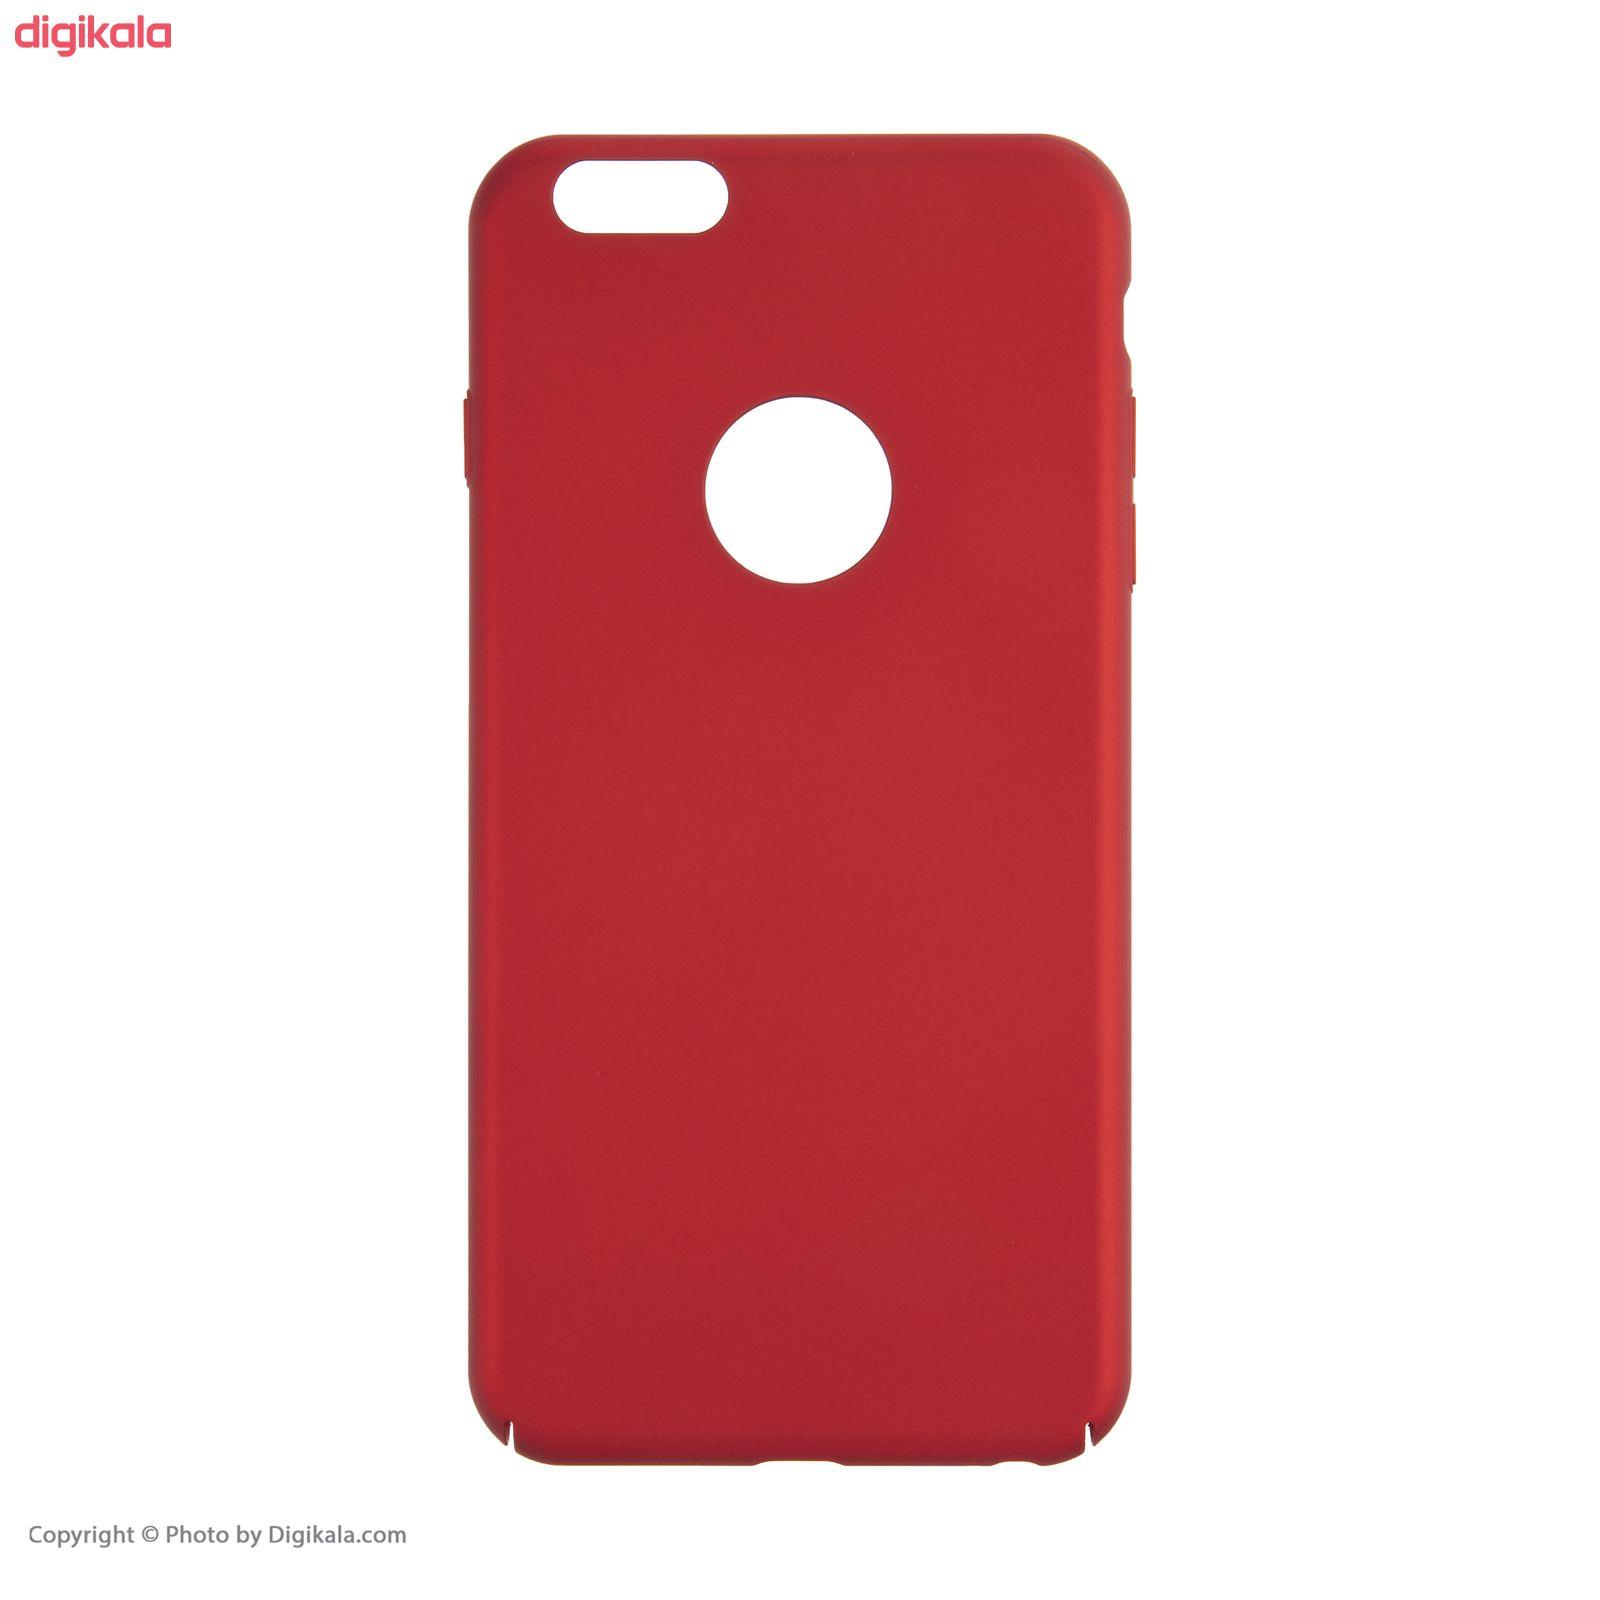 کاور جوی روم مدل JR-BP157 مناسب برای گوشی موبایل اپل iPhone 6 plus/6s plus  main 1 3